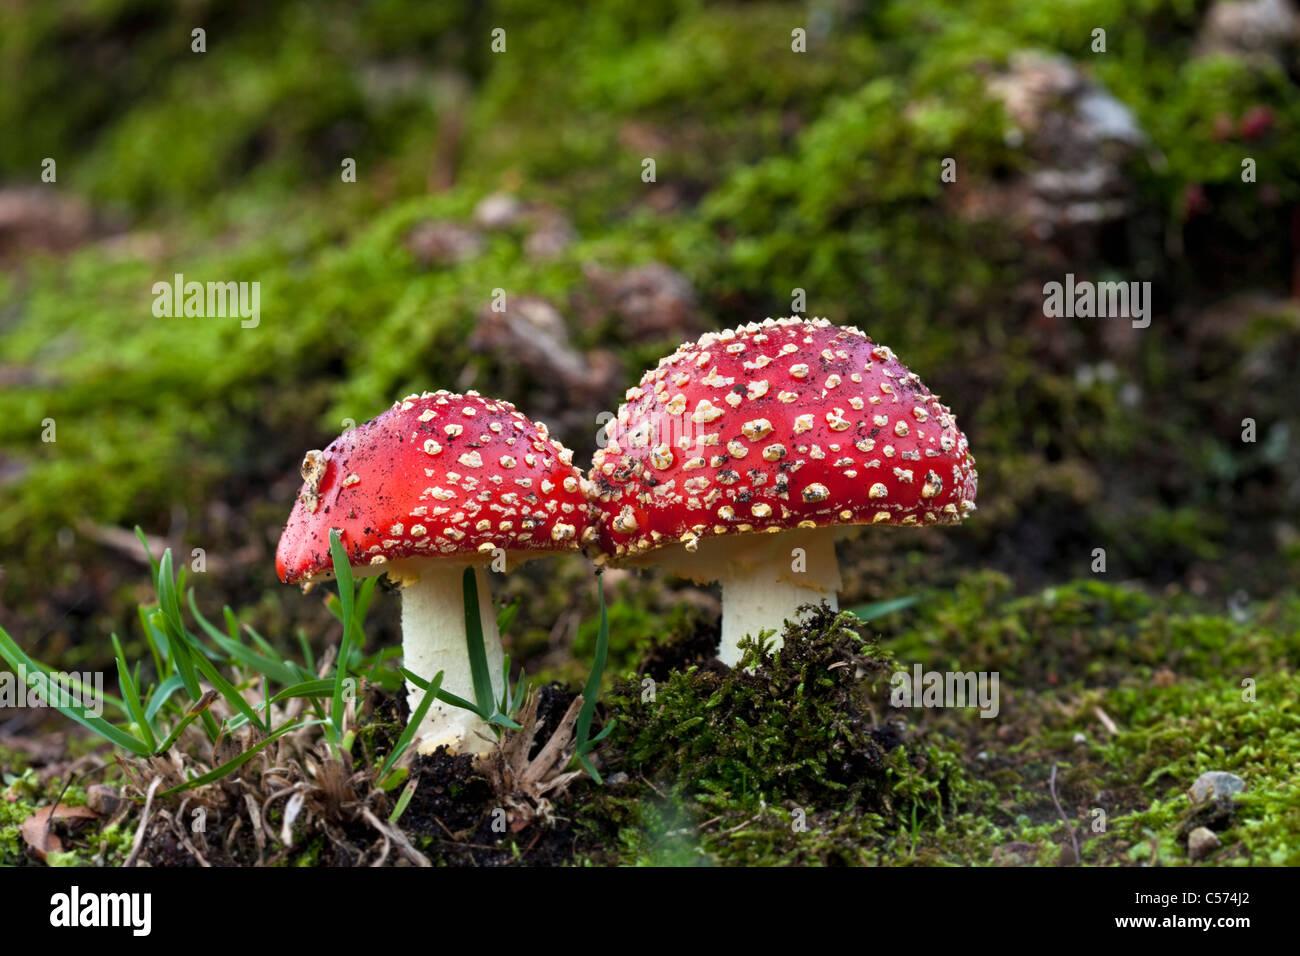 The Netherlands, Denekamp, Estate Singraven. Autumn. Fly Fungus. Amanita Muscaria. Fly agaric. - Stock Image